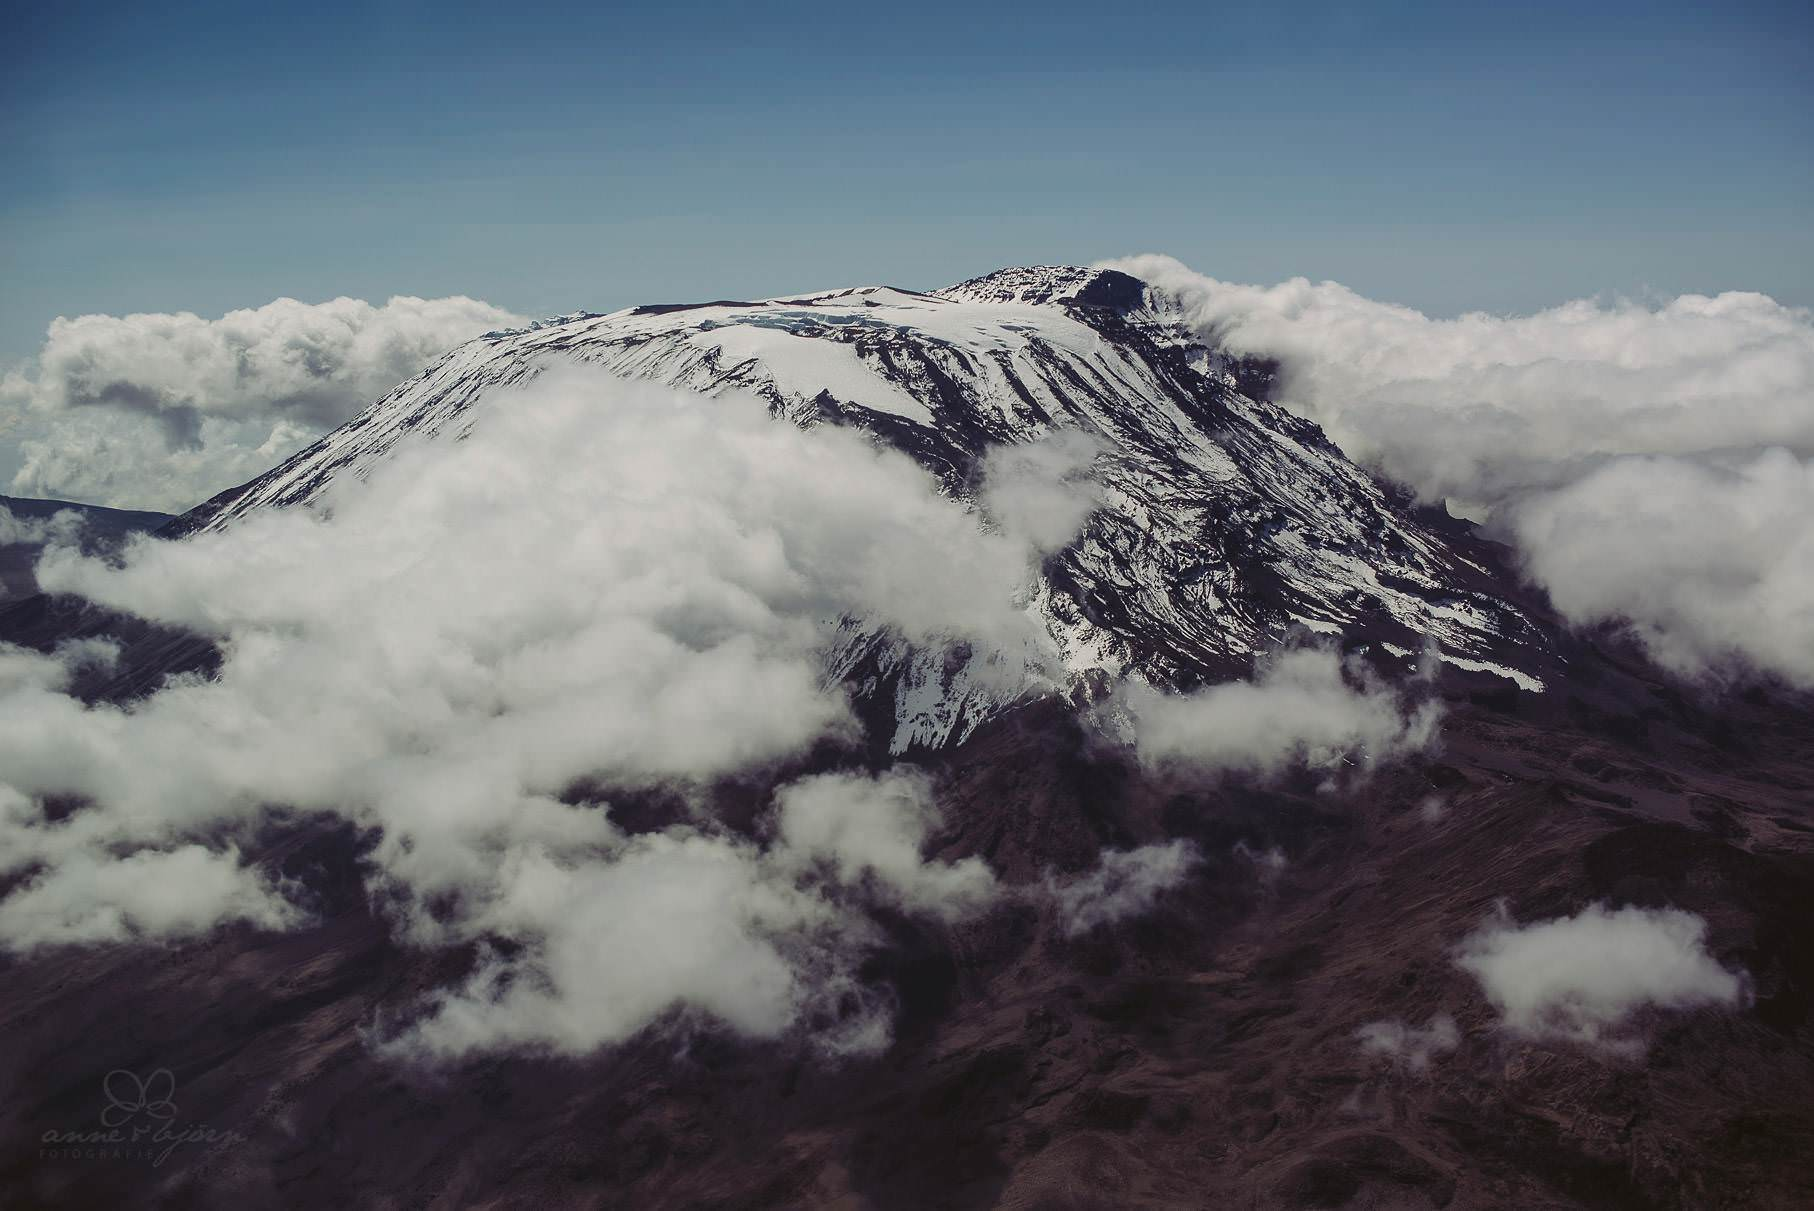 0008 tansania nd6 6035 anne bjoern fotografie hochzeitsfotograf hamburg - This is Tanzania - Serengeti, Kilimanjaro & Sansibar